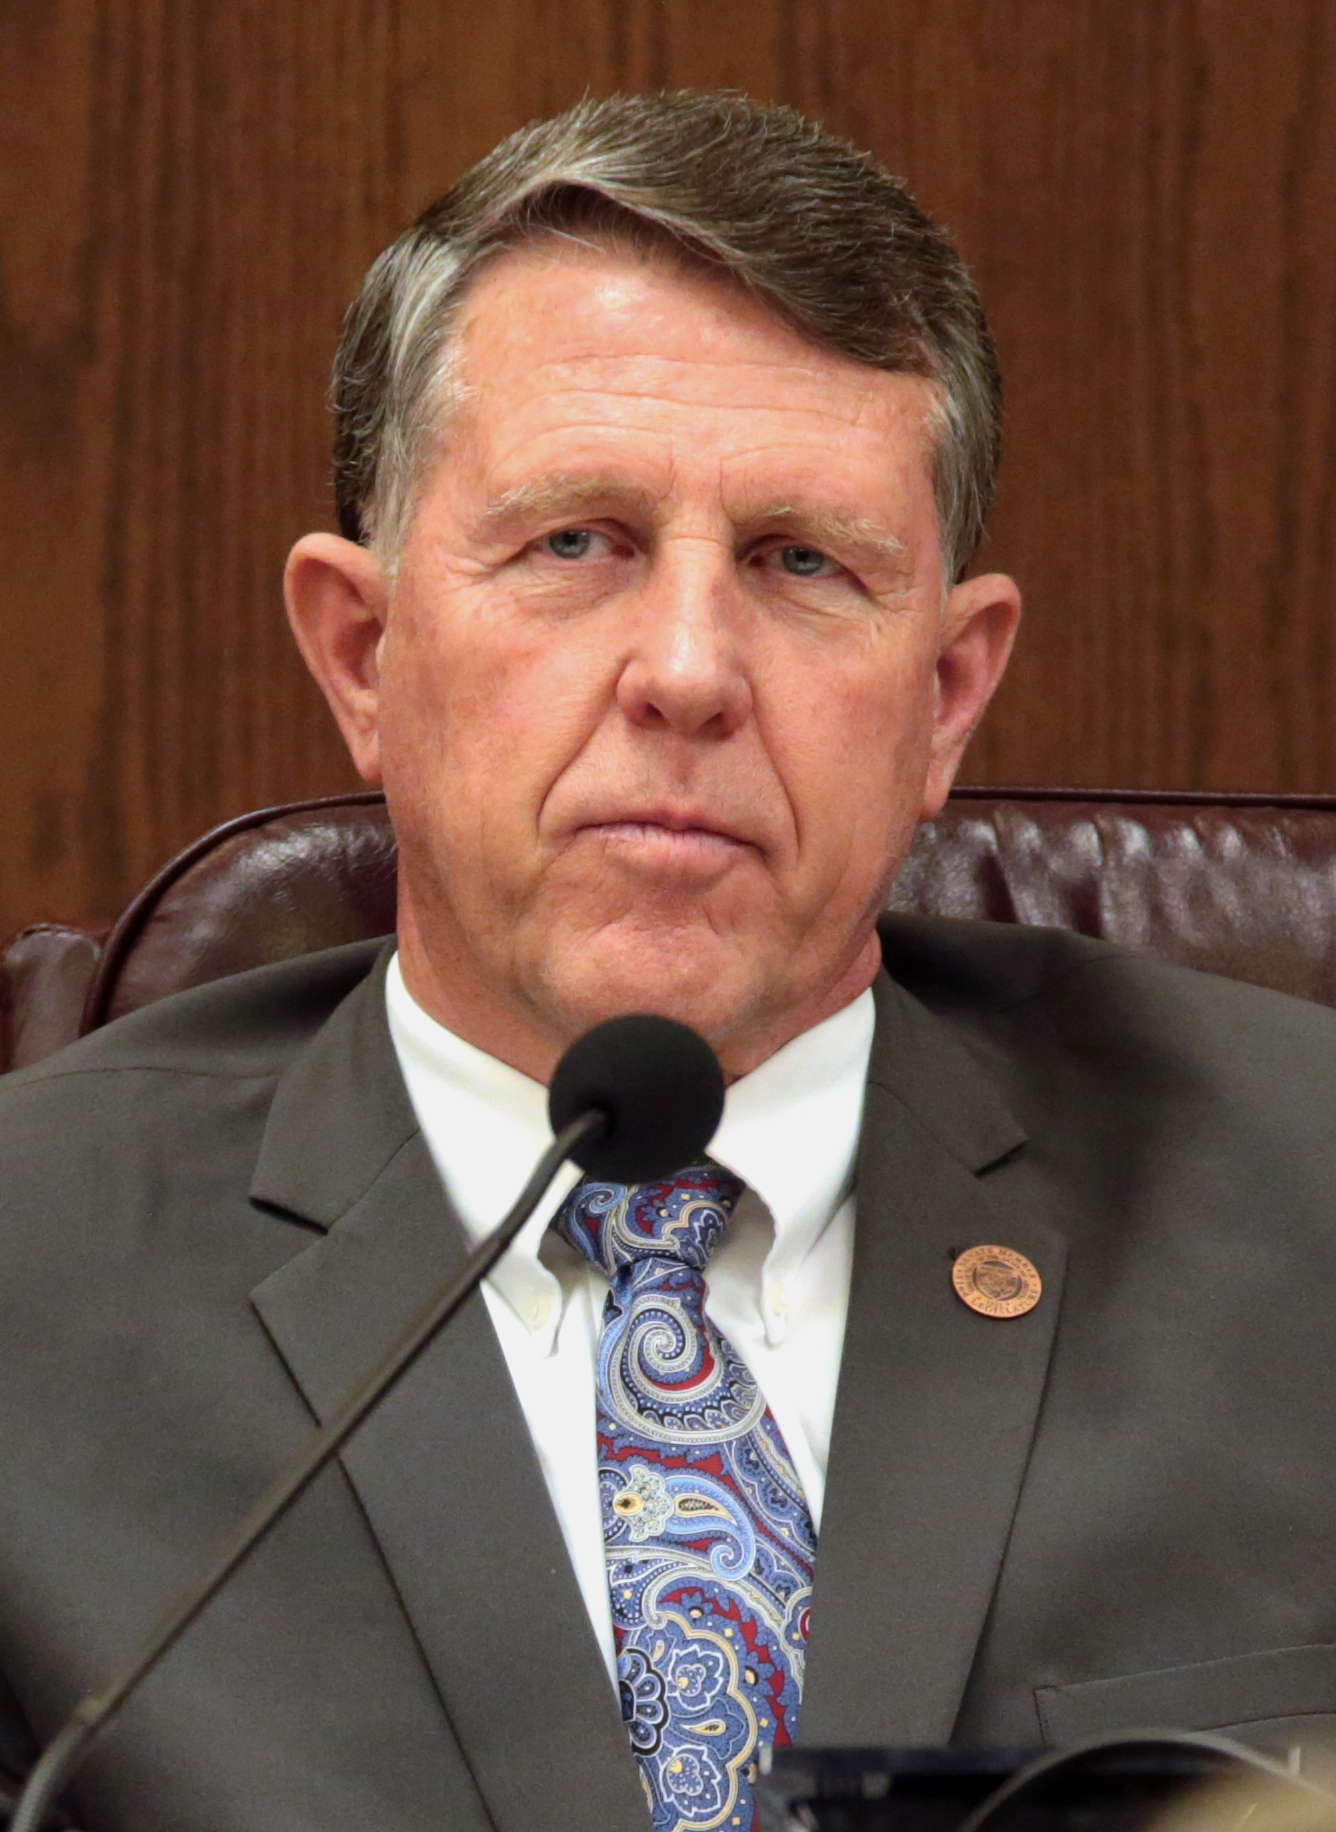 close-up color photo of Arizona state Sen. David C. Farnsworth of Mesa